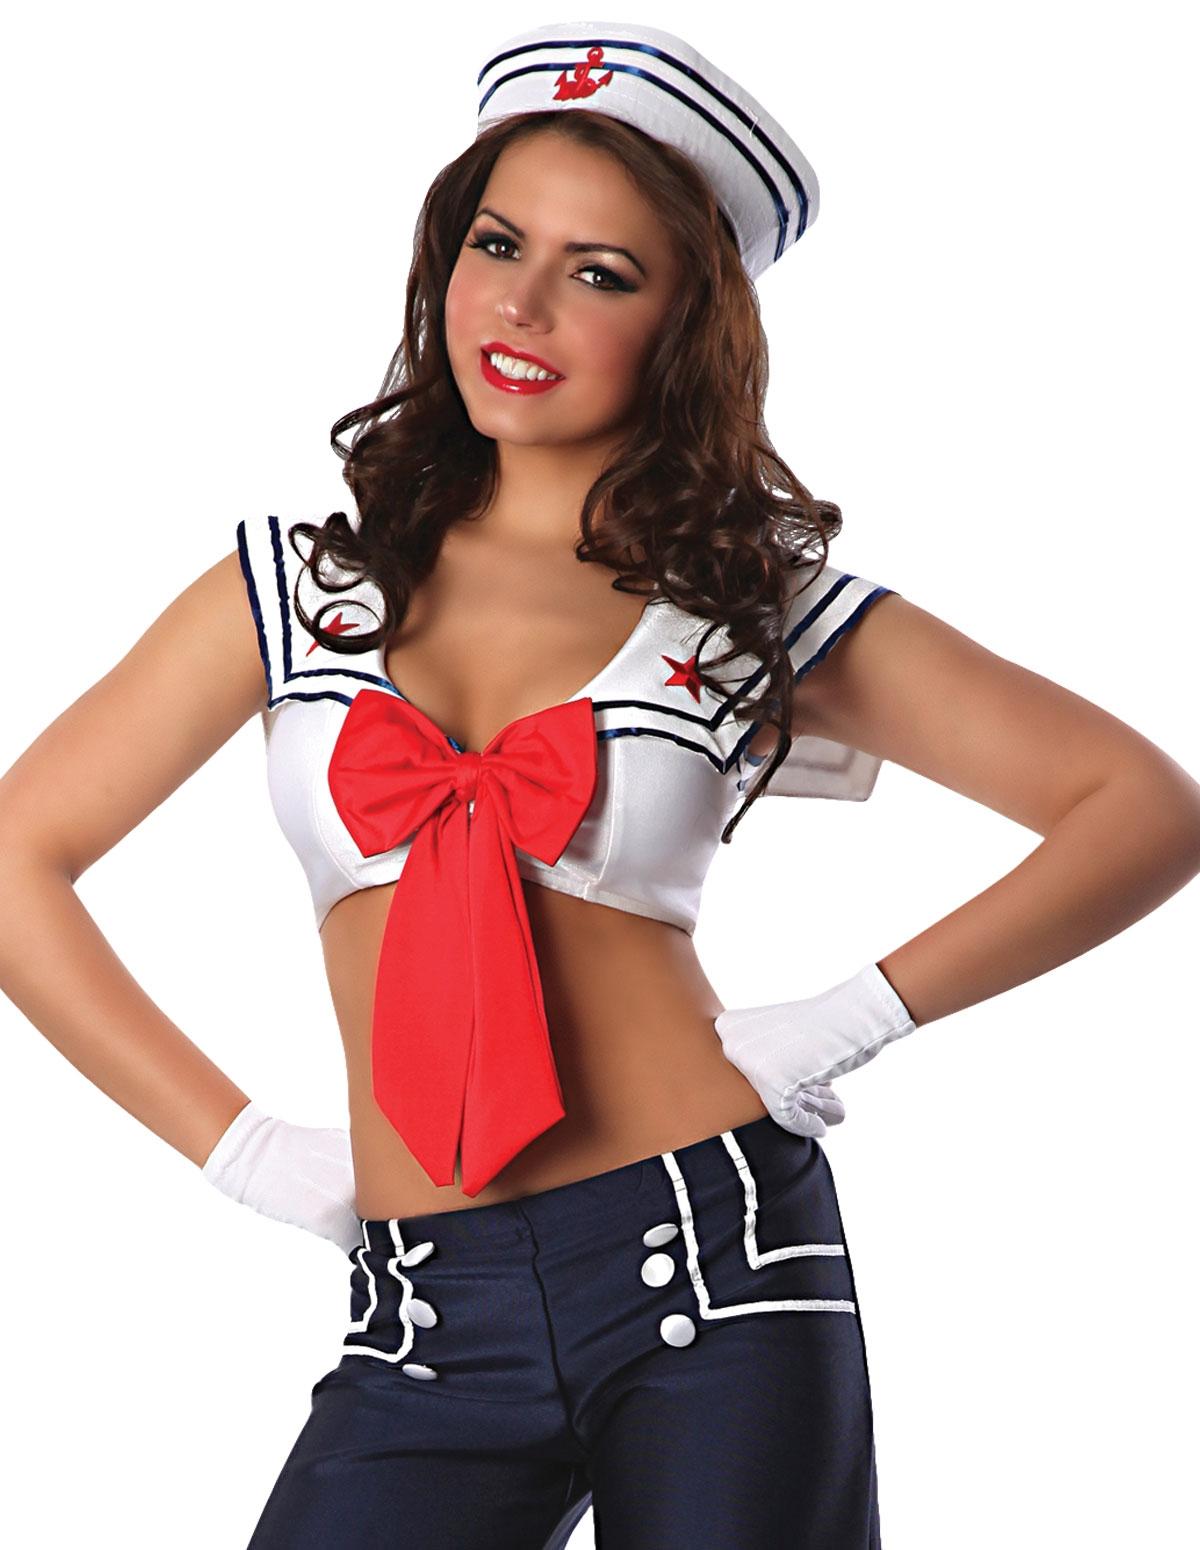 Miss Cracker Jack Costume